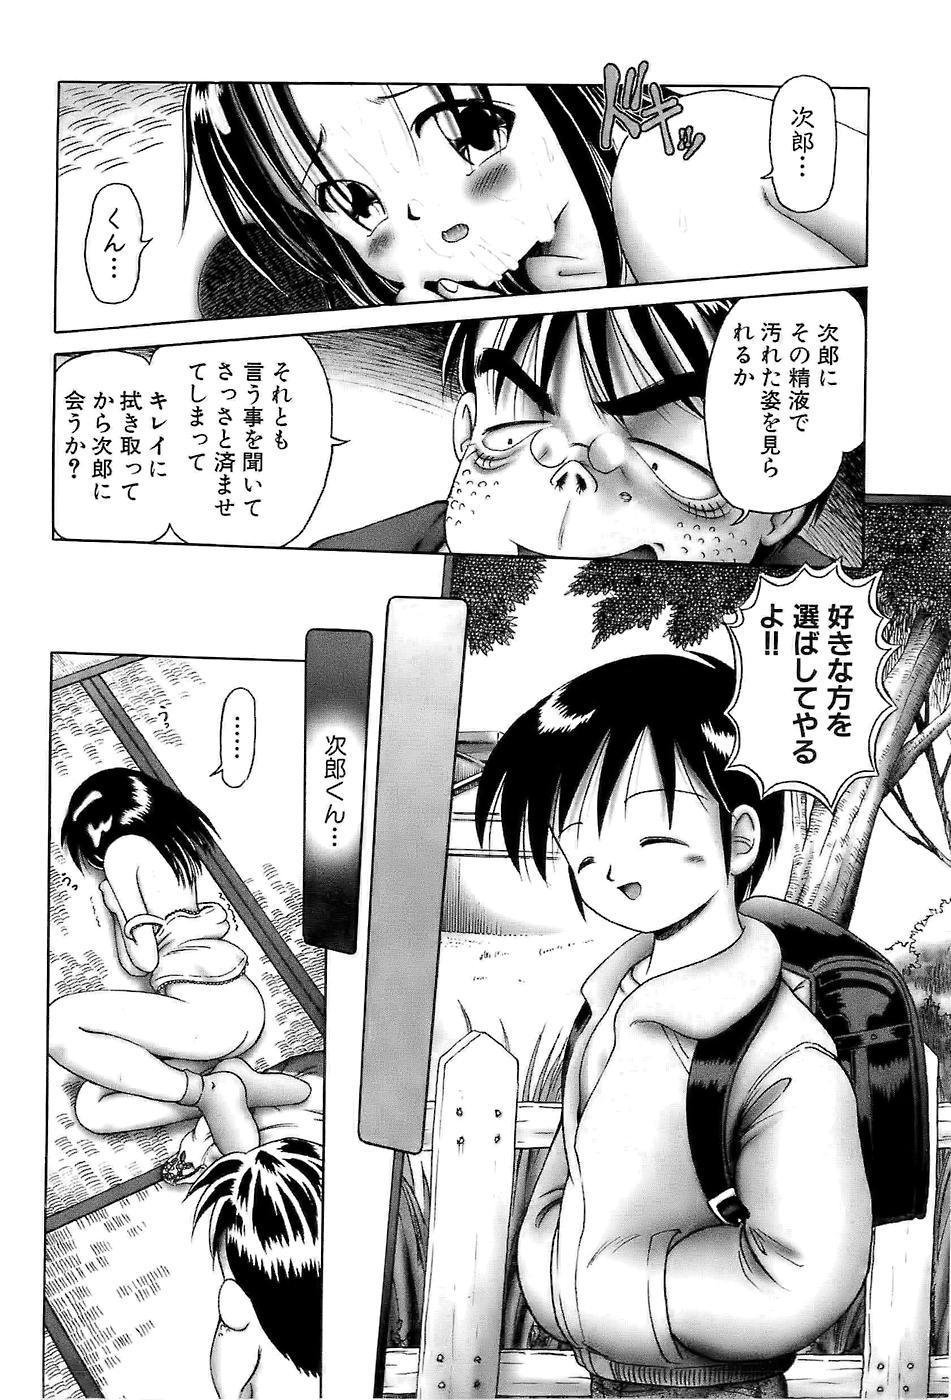 [Bow Rei] Osanai Kajitsu -Inkou Shougakusei no Houkago- Jou 35